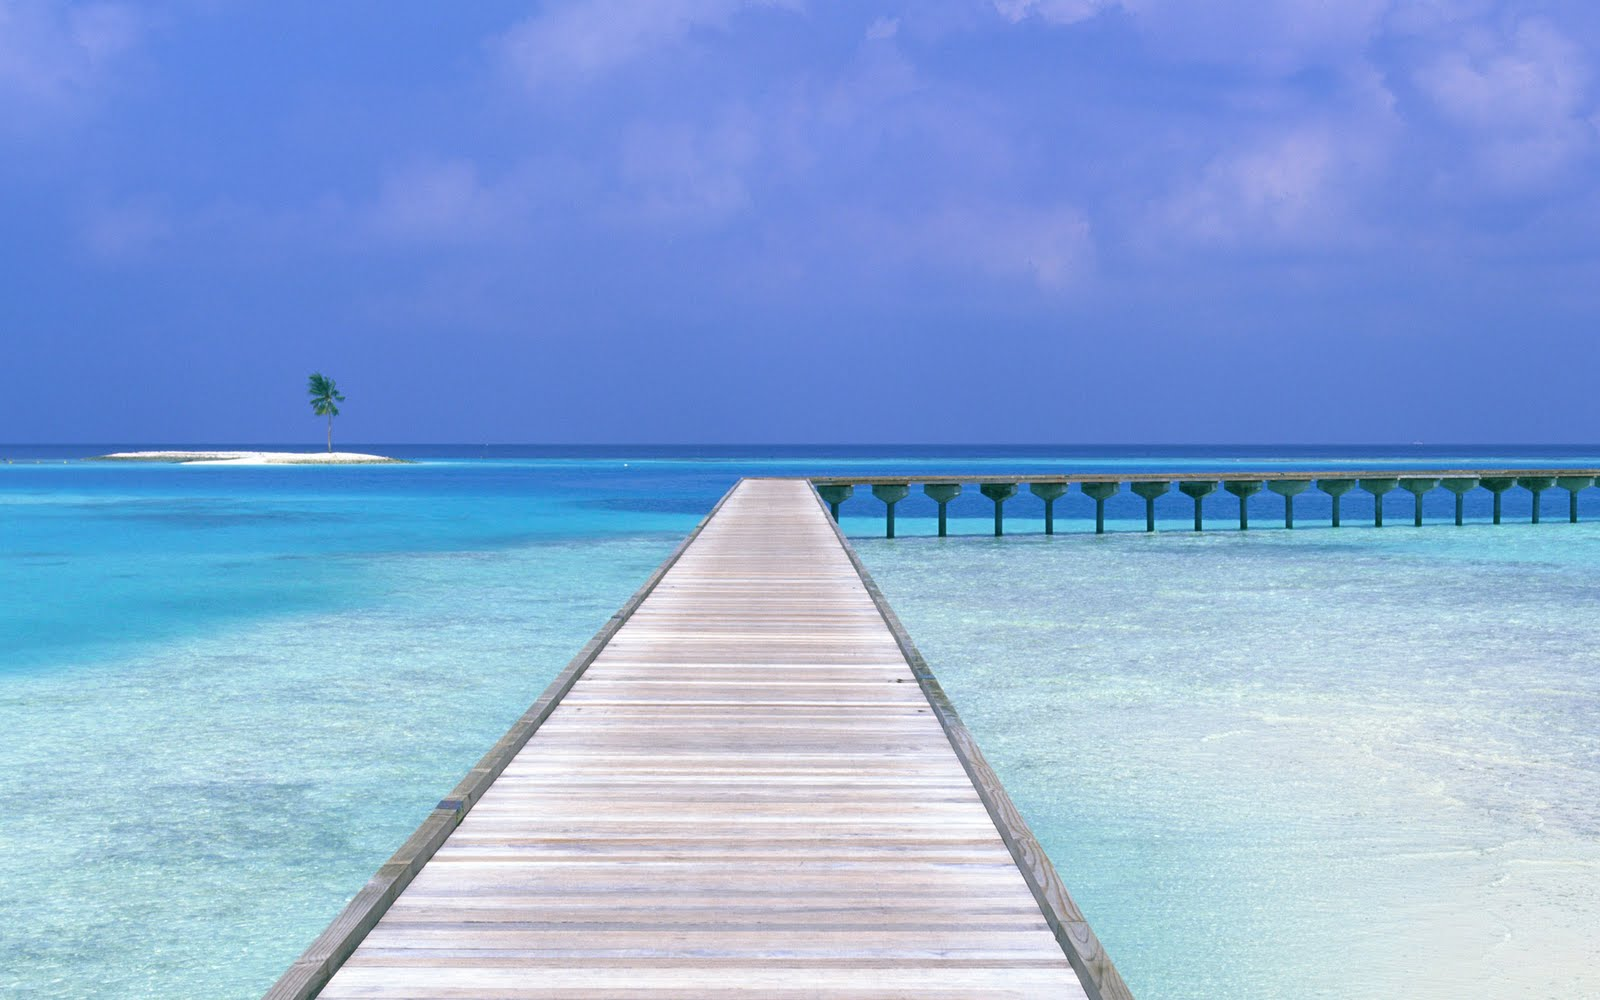 http://3.bp.blogspot.com/-iu59_-yZr78/TbWOcaWNr4I/AAAAAAAAAfg/DvSOo6fPRjg/s1600/Maldives_Paradise%28quewallpapers.com%29.jpg